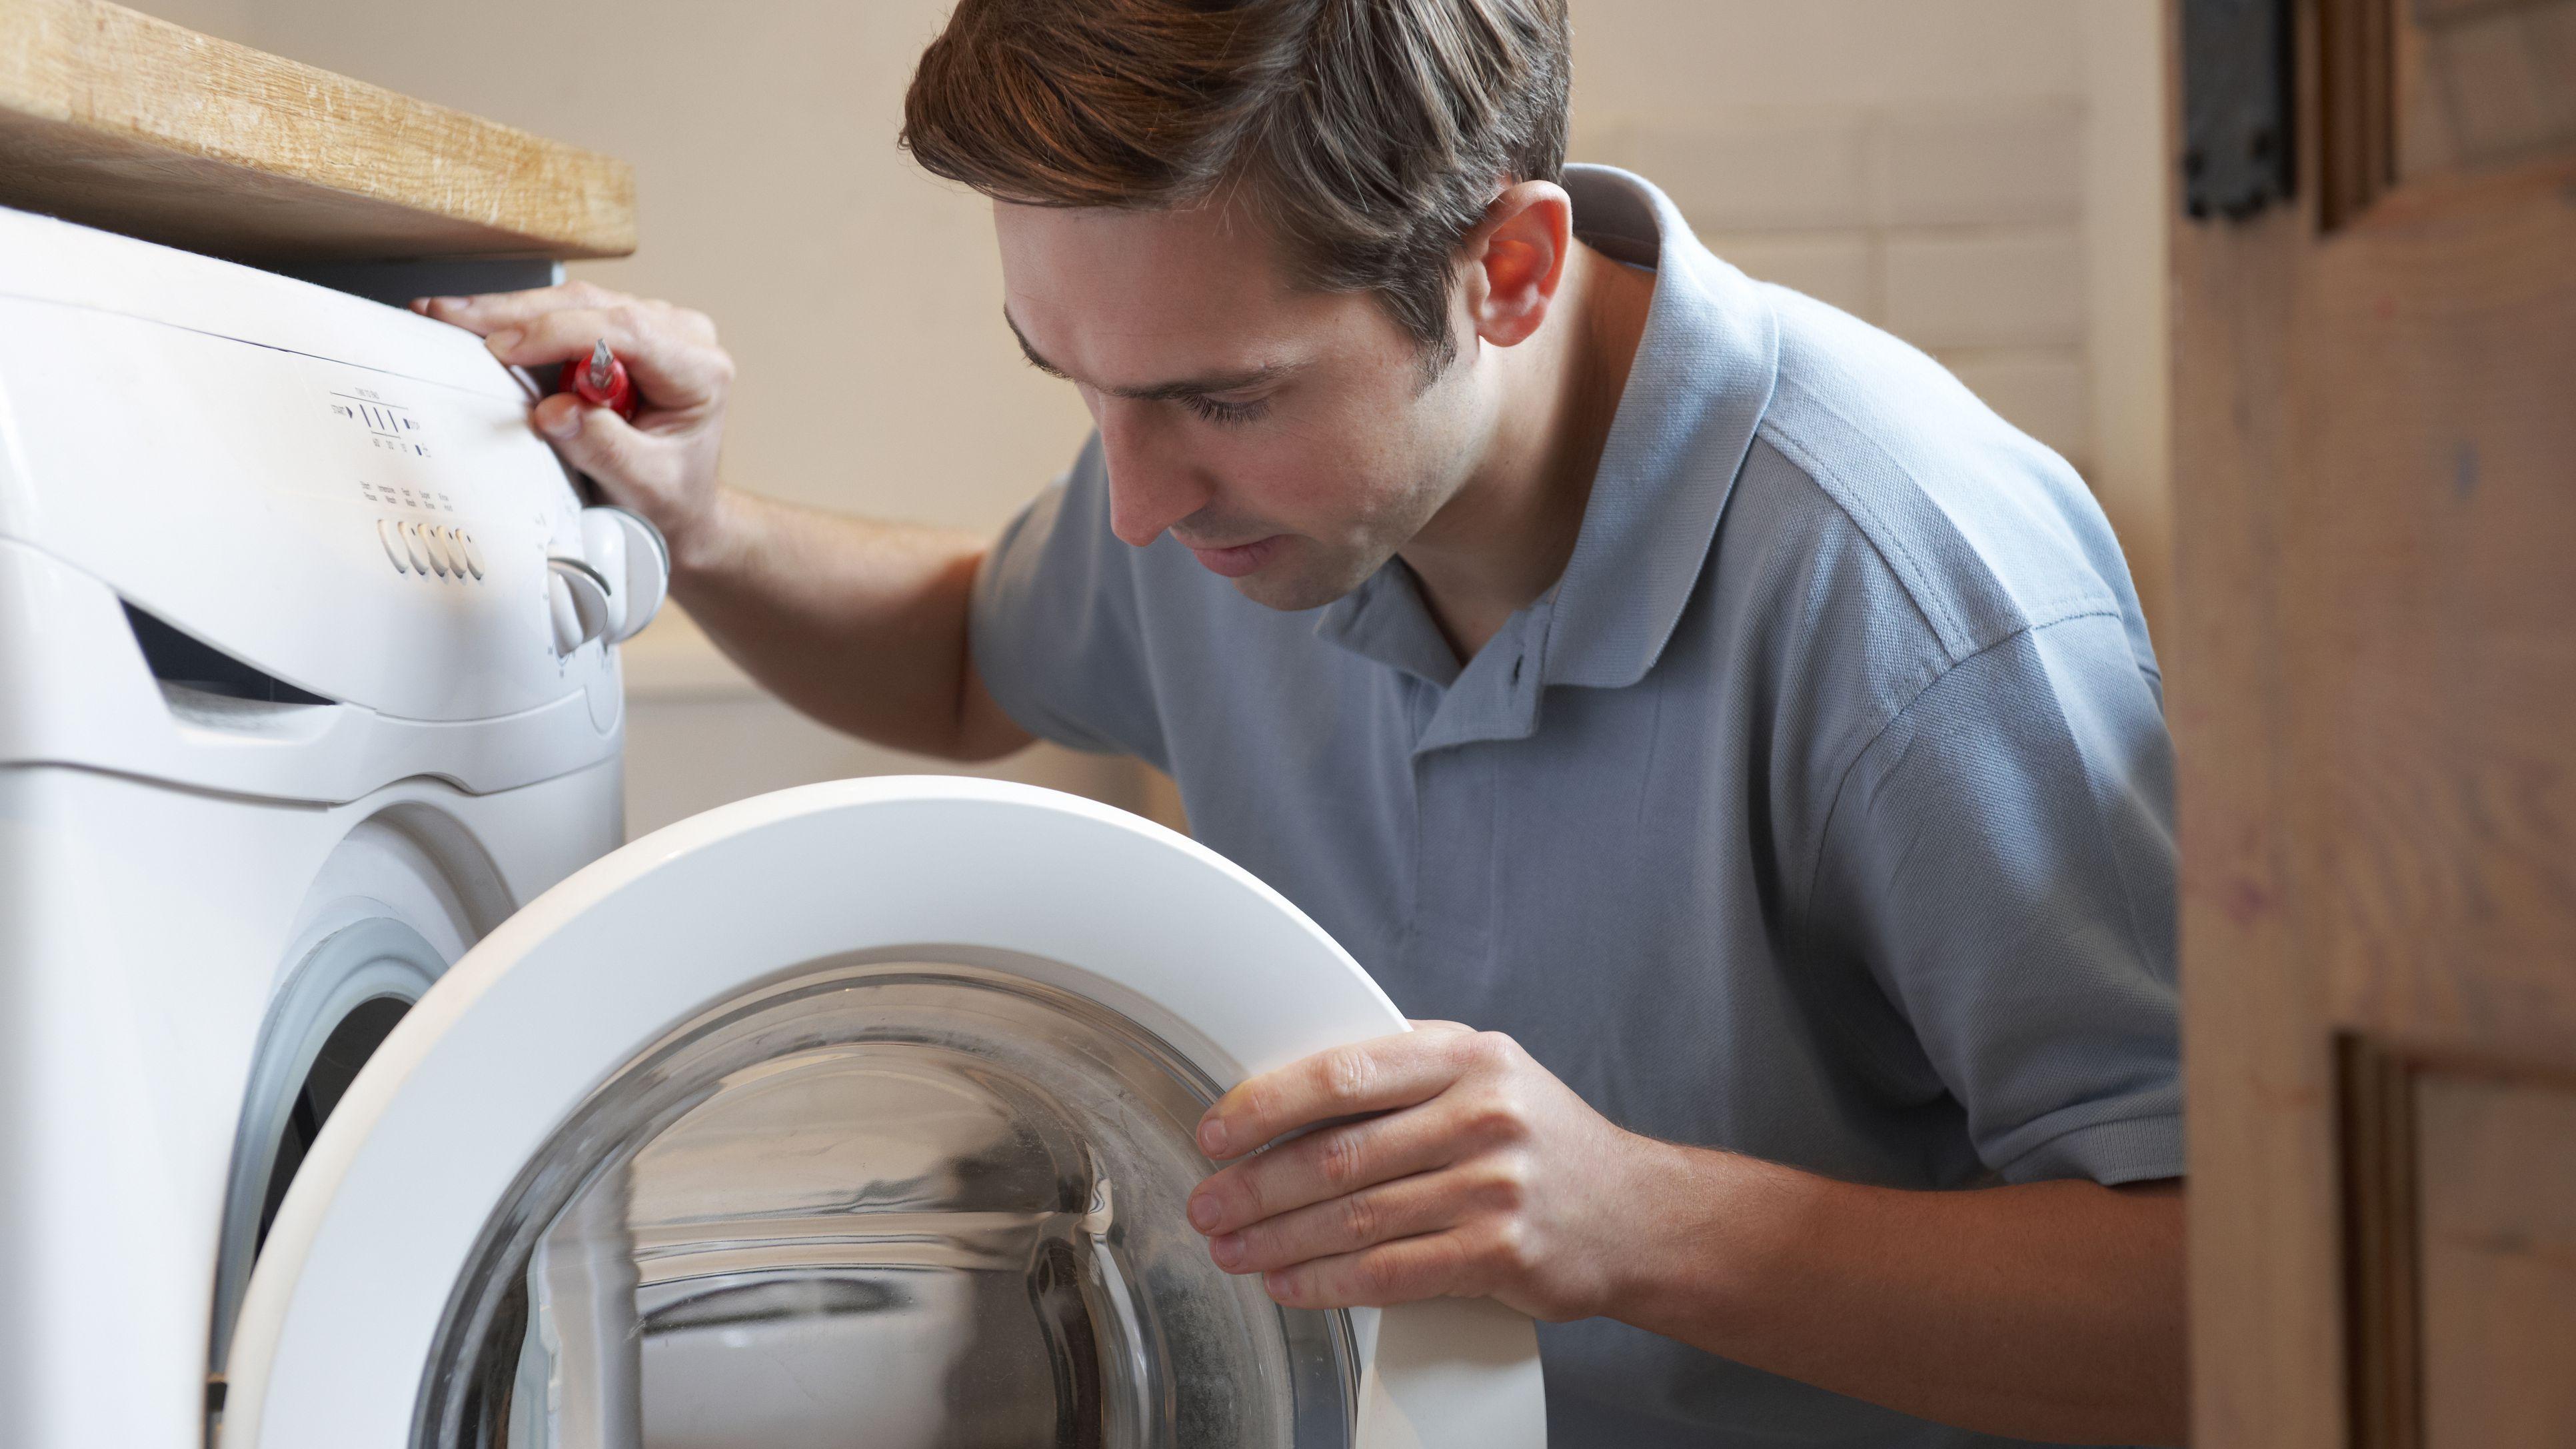 Washing Machine Repair - Some Important Tips